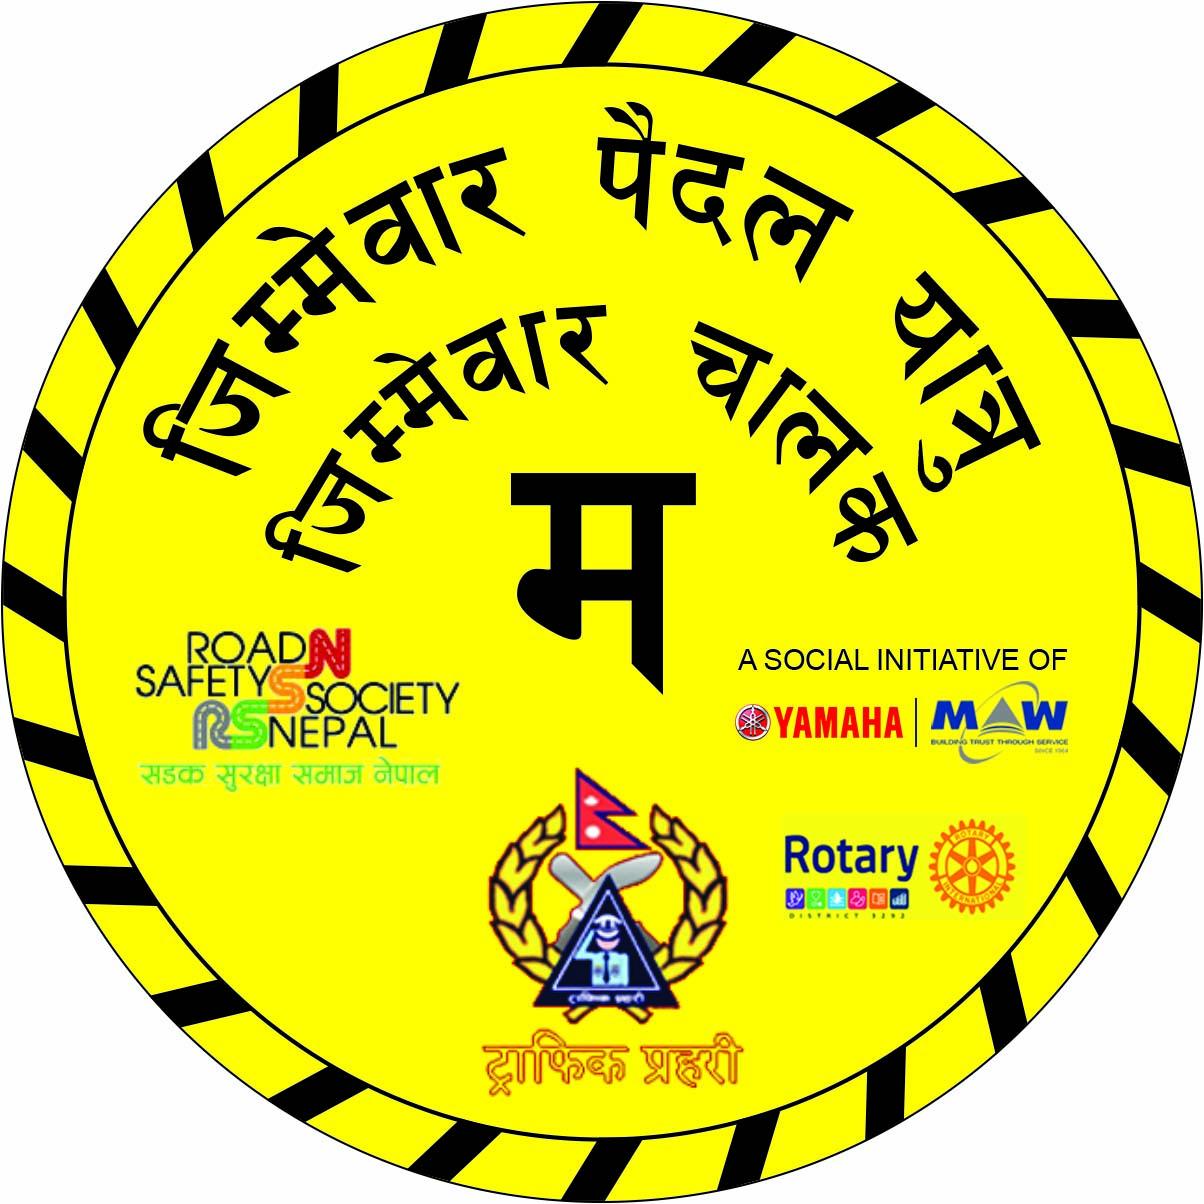 4th-UN-Global-Road-Safety-Week-2017-Traffic-Awareness-Program-Rotary-club-of-Kakarvitta-62